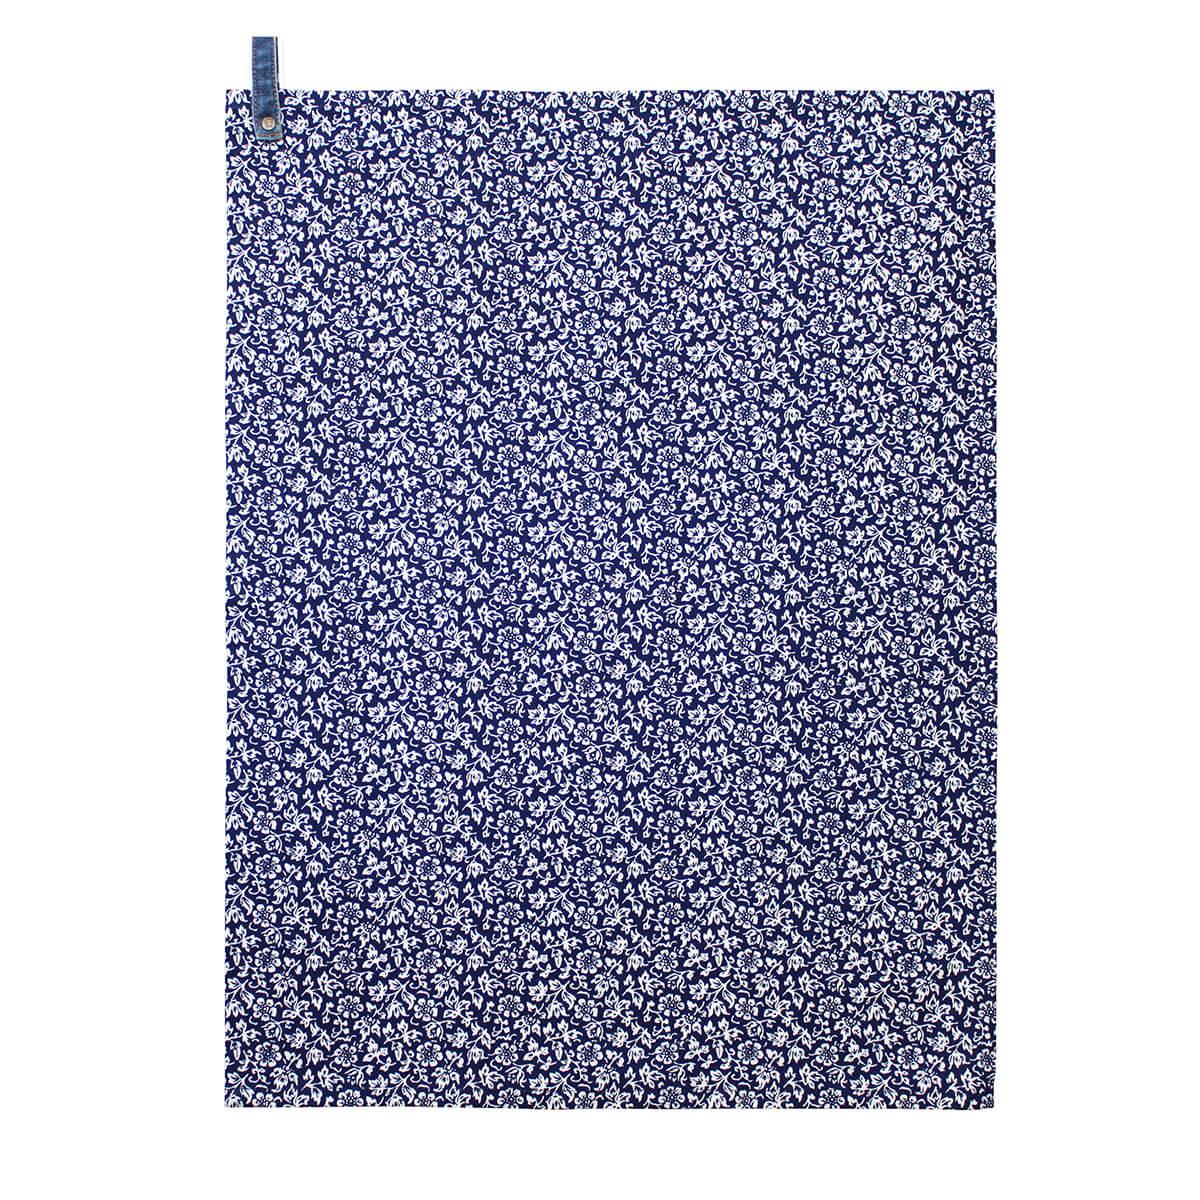 Онлайн каталог PROMENU: Полотенце кухонное Laura Ashley BLUEPRINT, 50х70 см, синий в белый цветочек                                   178126